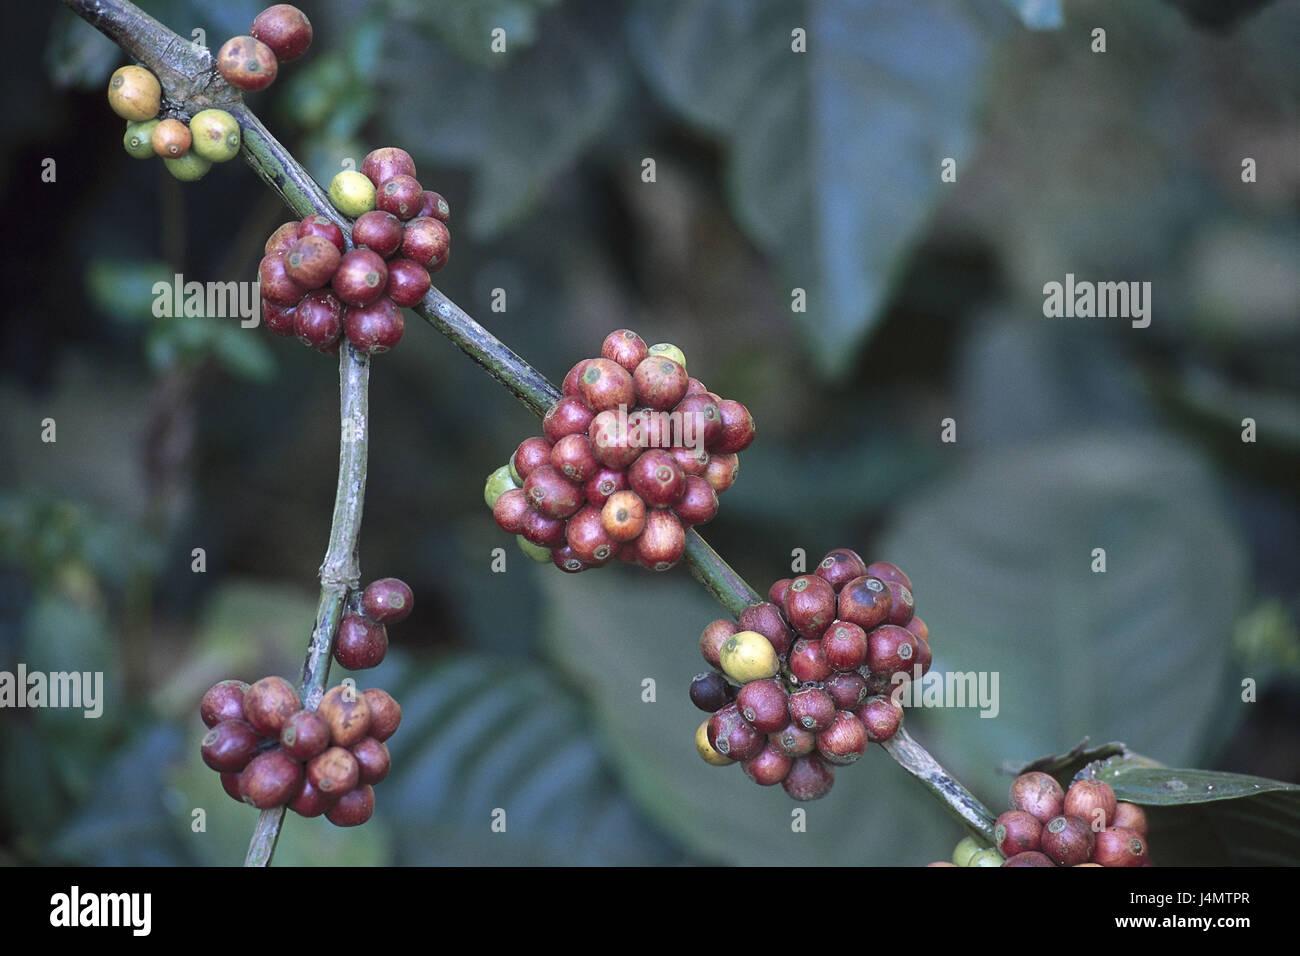 Coffee tree, branch, beans, detail Asia, South Asia, Hindi Bharat, India, Südindien, Kerala, Periyar, plant, - Stock Image